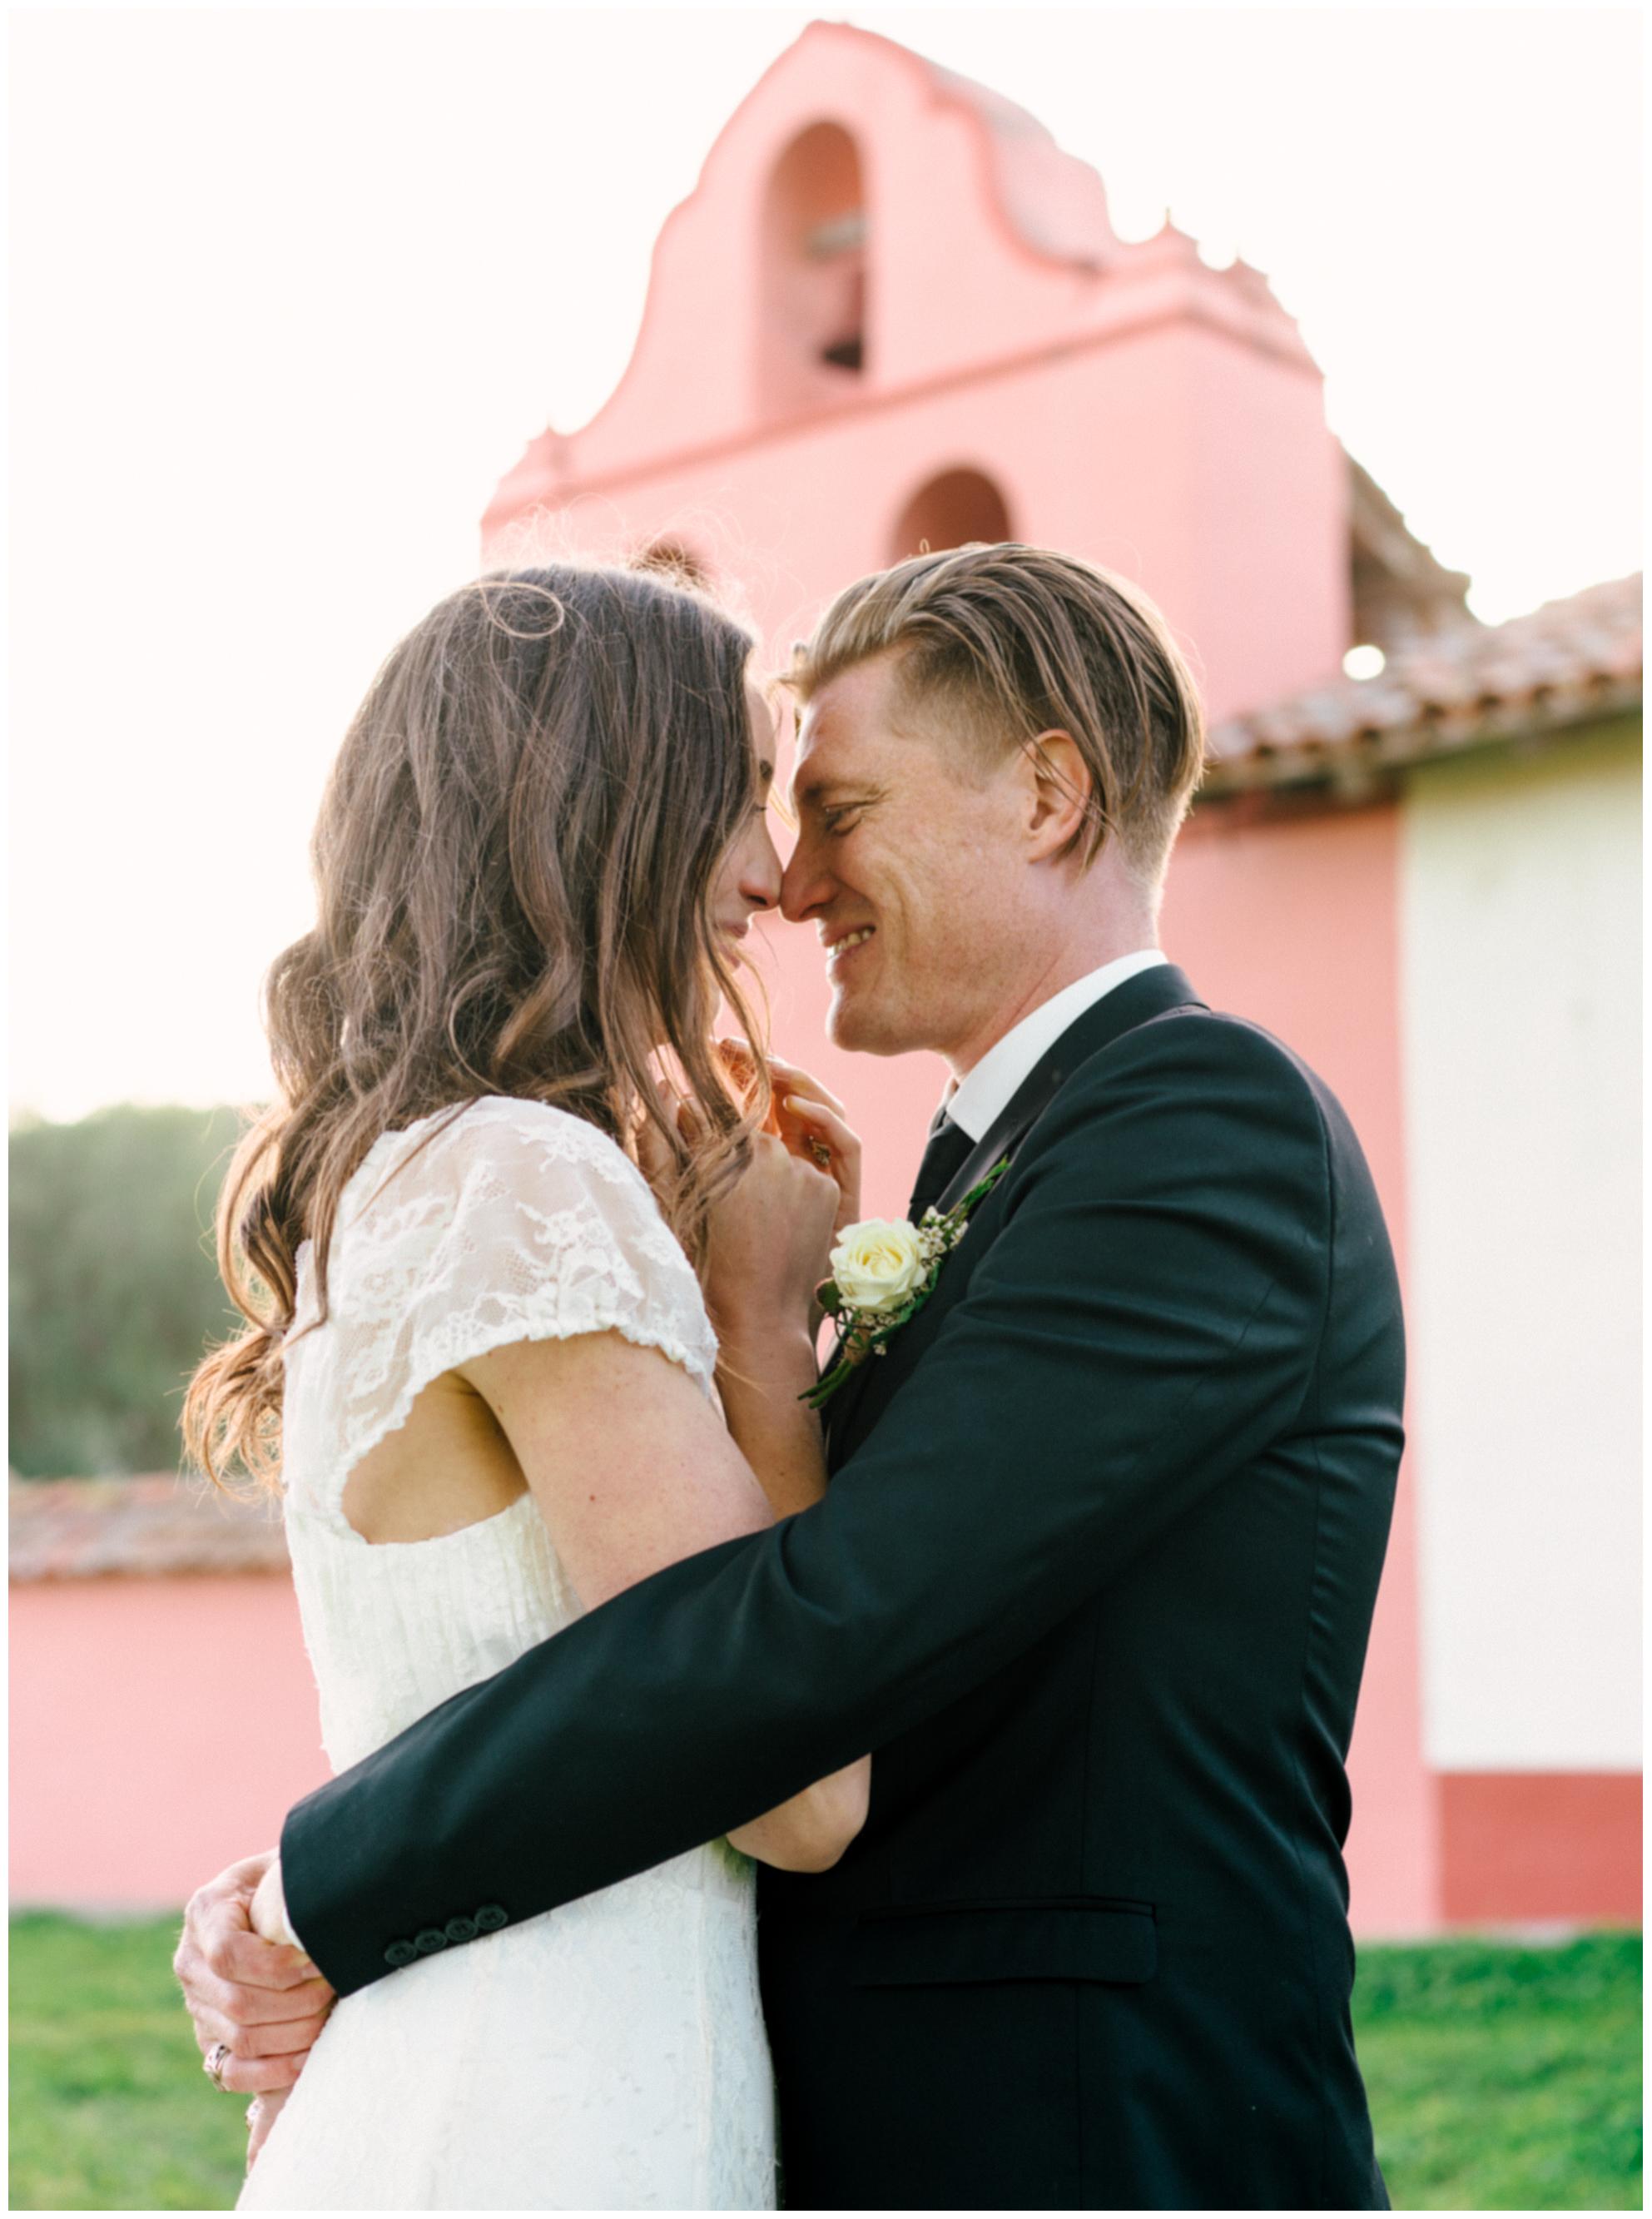 Santa_Barbara_Wedding_Photographer_Pinnel_Photography_La_Purisima_Mission-054.jpg